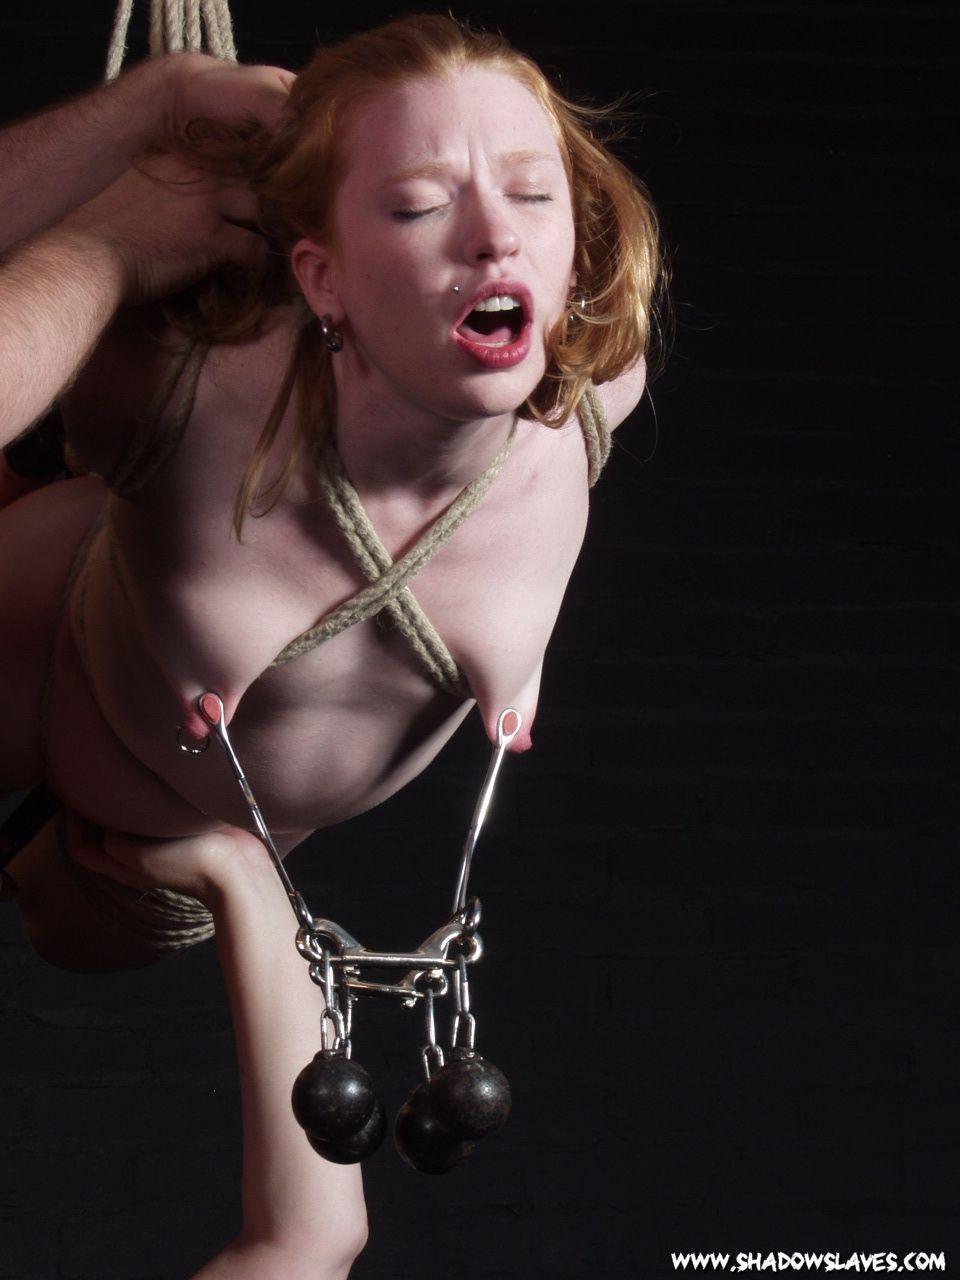 Bdsm Porno Video hot pornstar bdsm bondage with cumshot. lesbian sex video